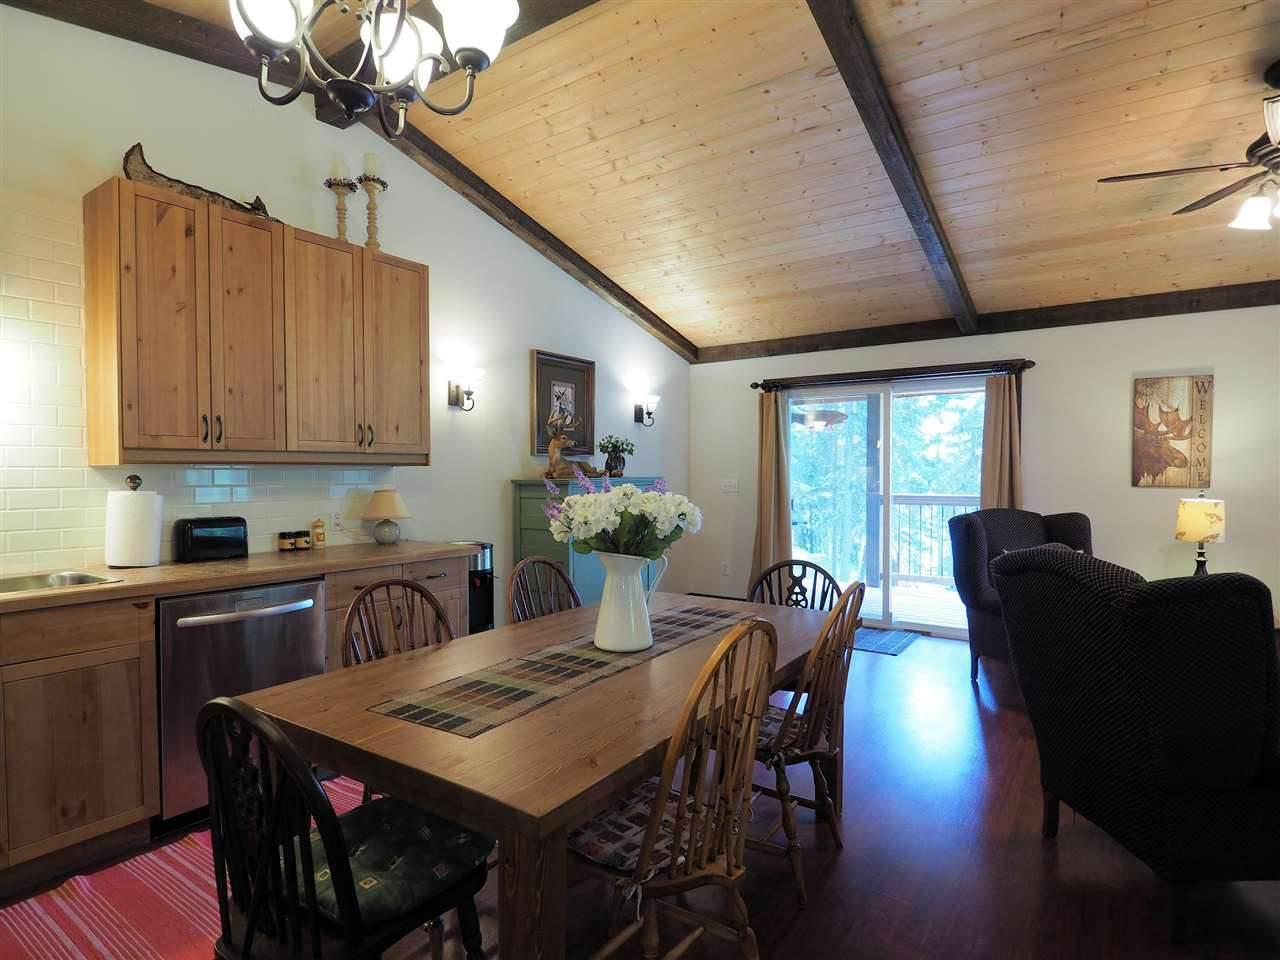 Photo 14: Photos: 8222 CENTENNIAL Road in Bridge Lake: Bridge Lake/Sheridan Lake House for sale (100 Mile House (Zone 10))  : MLS®# R2457362